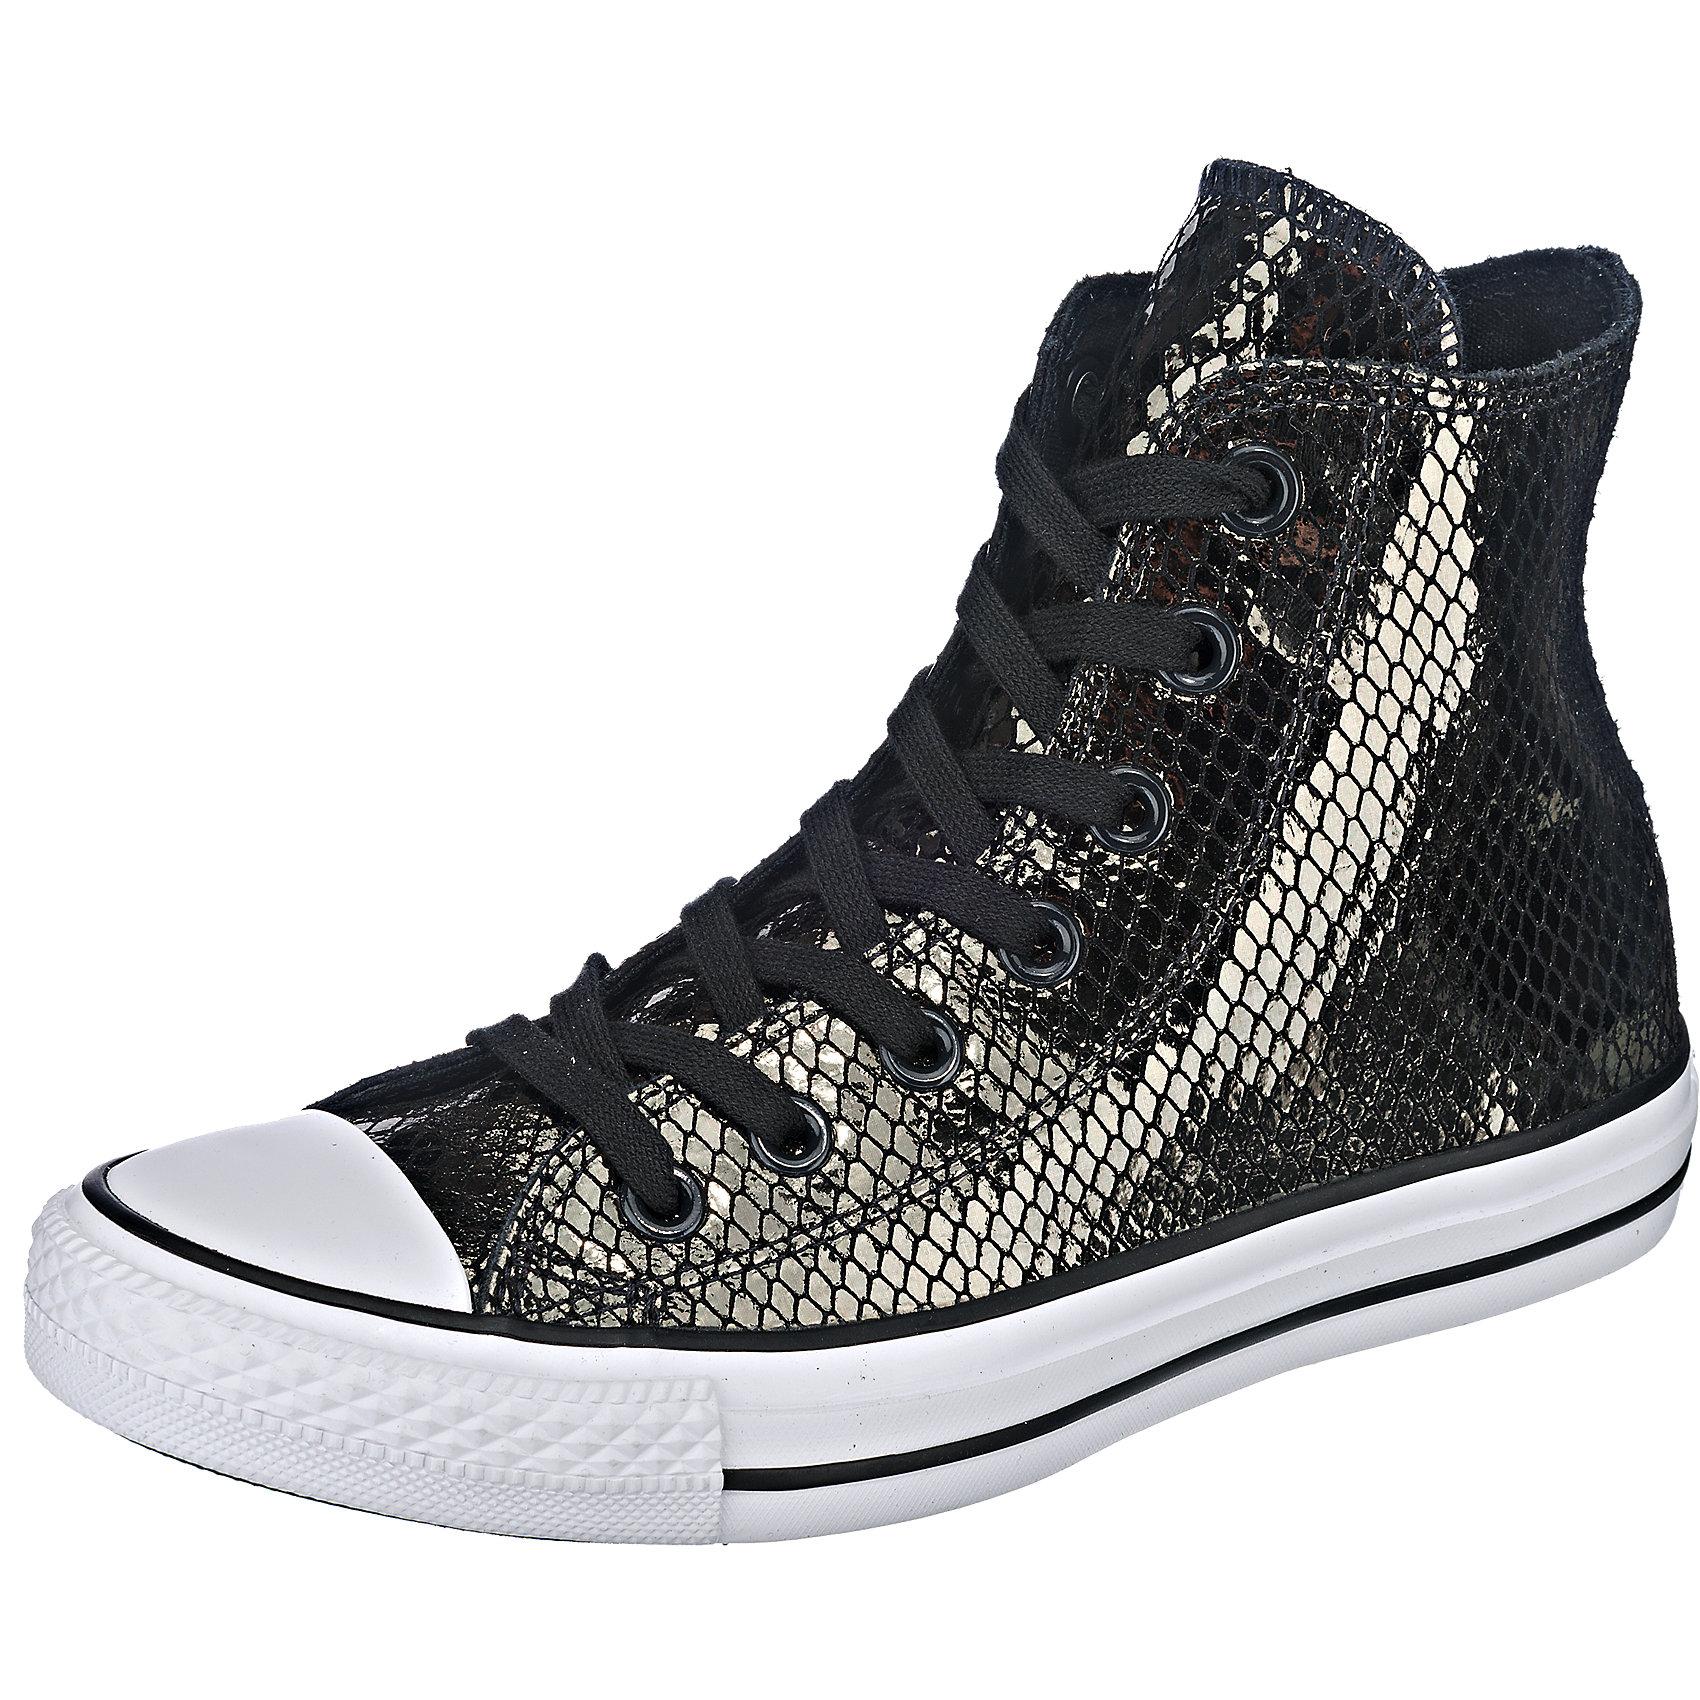 Neu CONVERSE schwarz Chuck Taylor All Star Hi Sneakers schwarz CONVERSE 5772583 c1a7b1